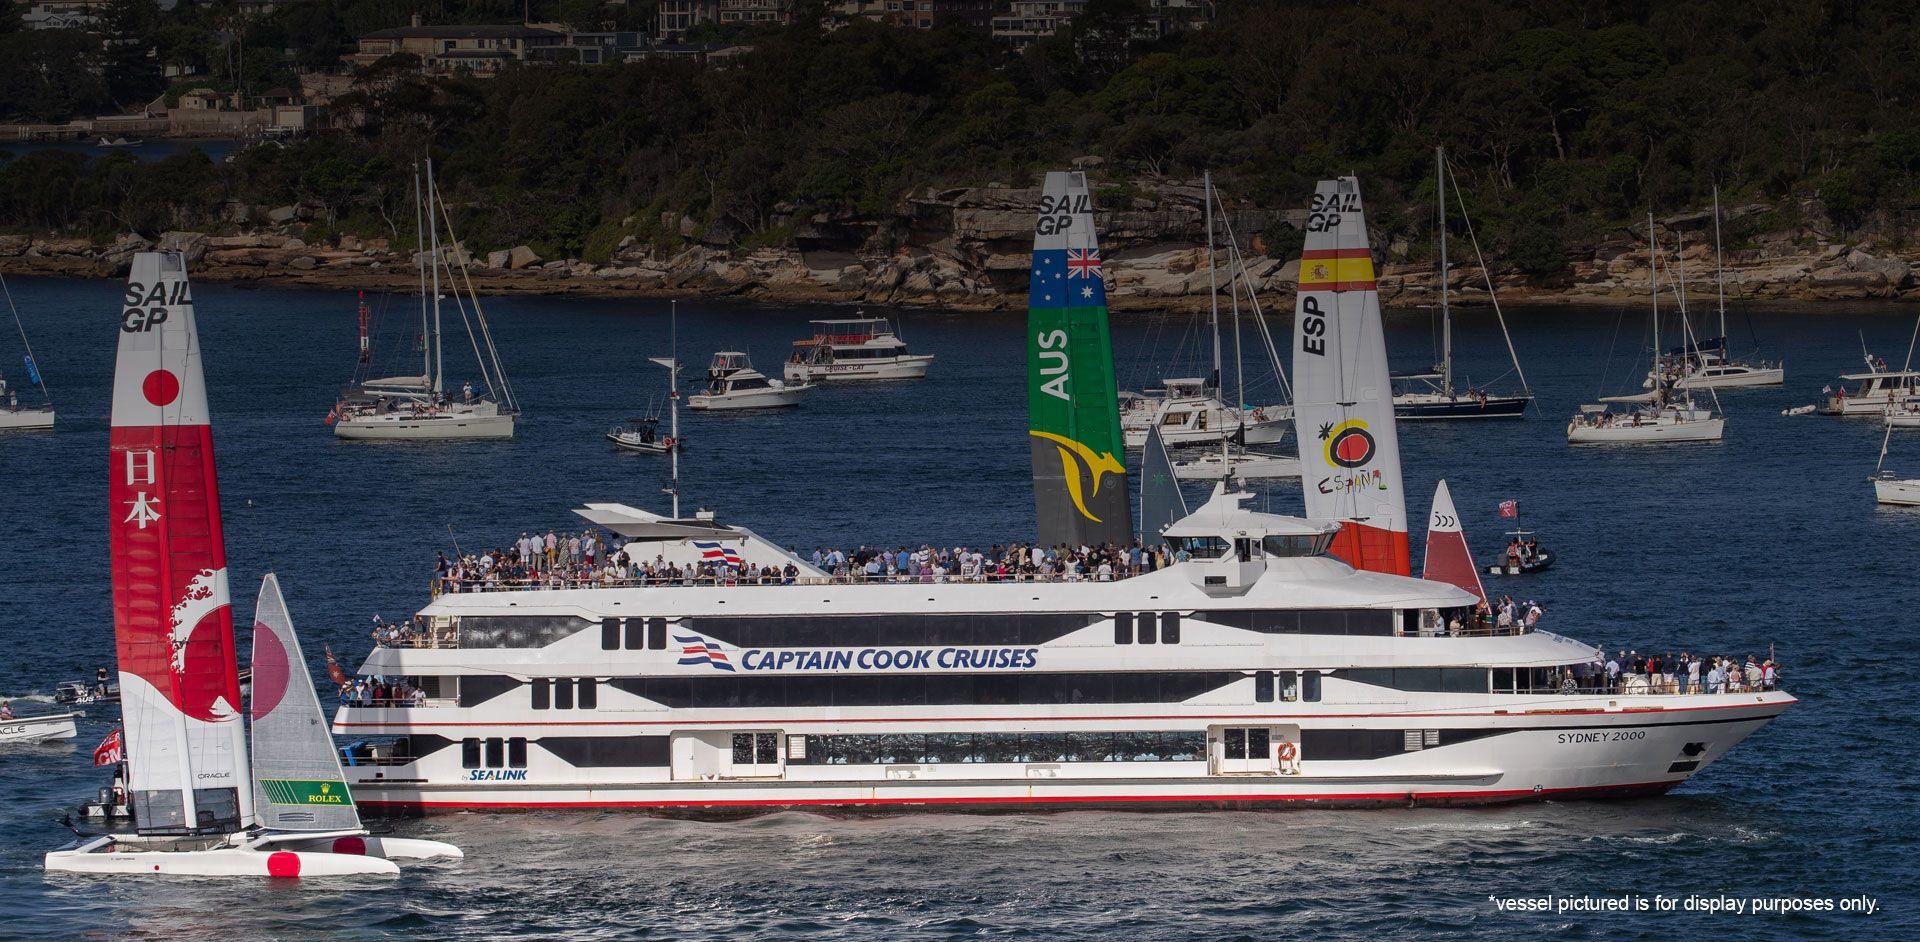 SailGP's – Official Access Spectator Boats - Slide 9